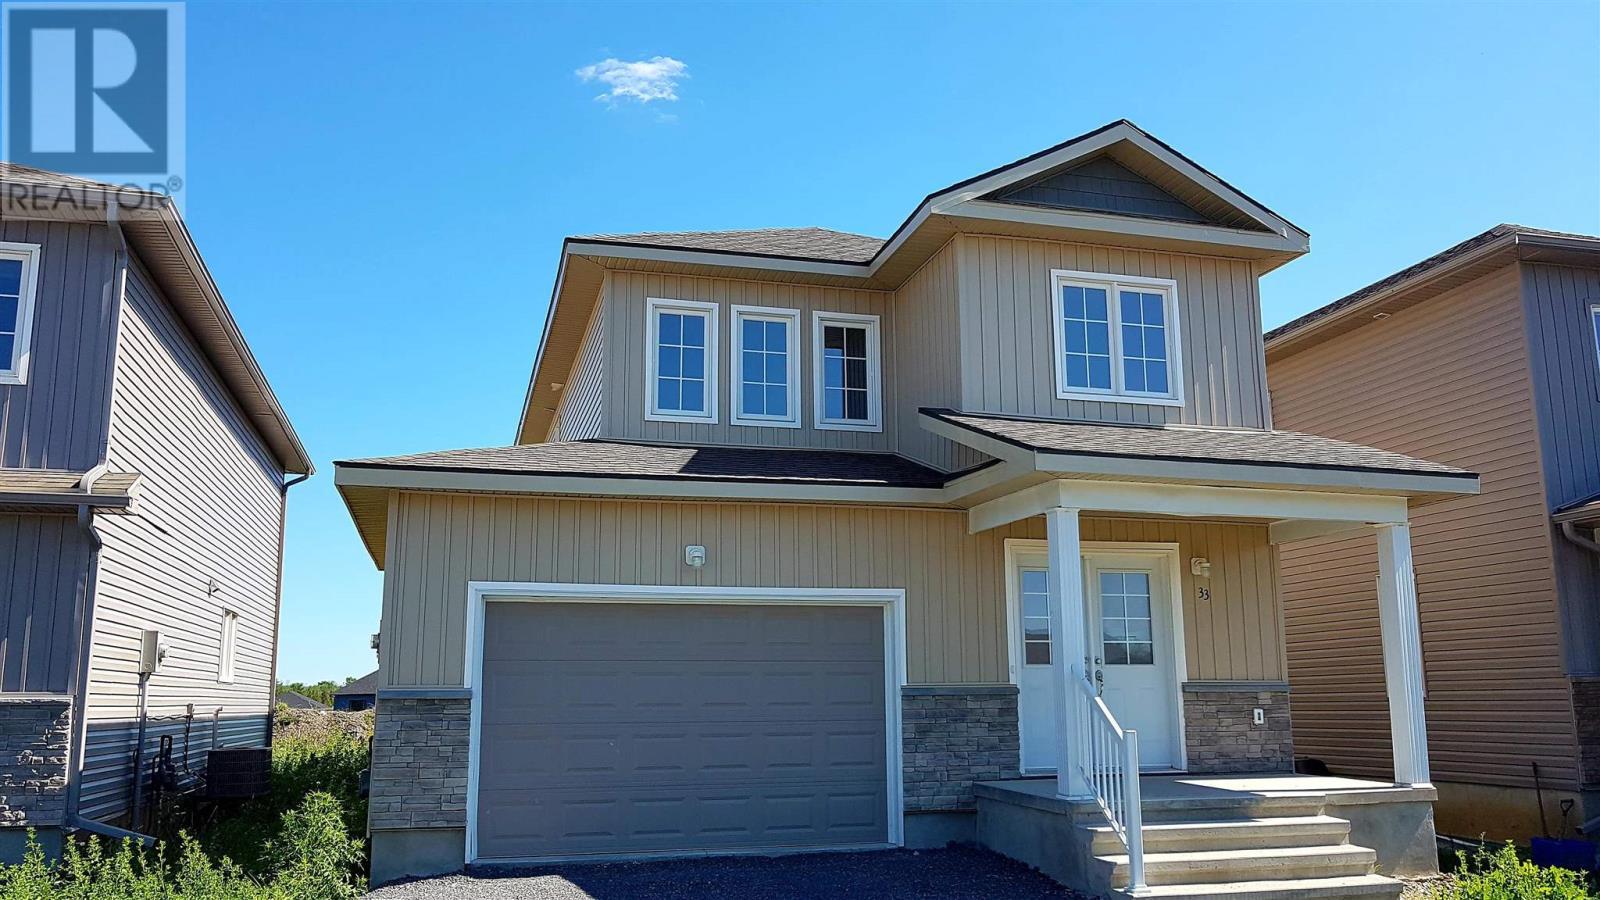 Property Listing: 33 Brennan Cres, Odessa, Ontario